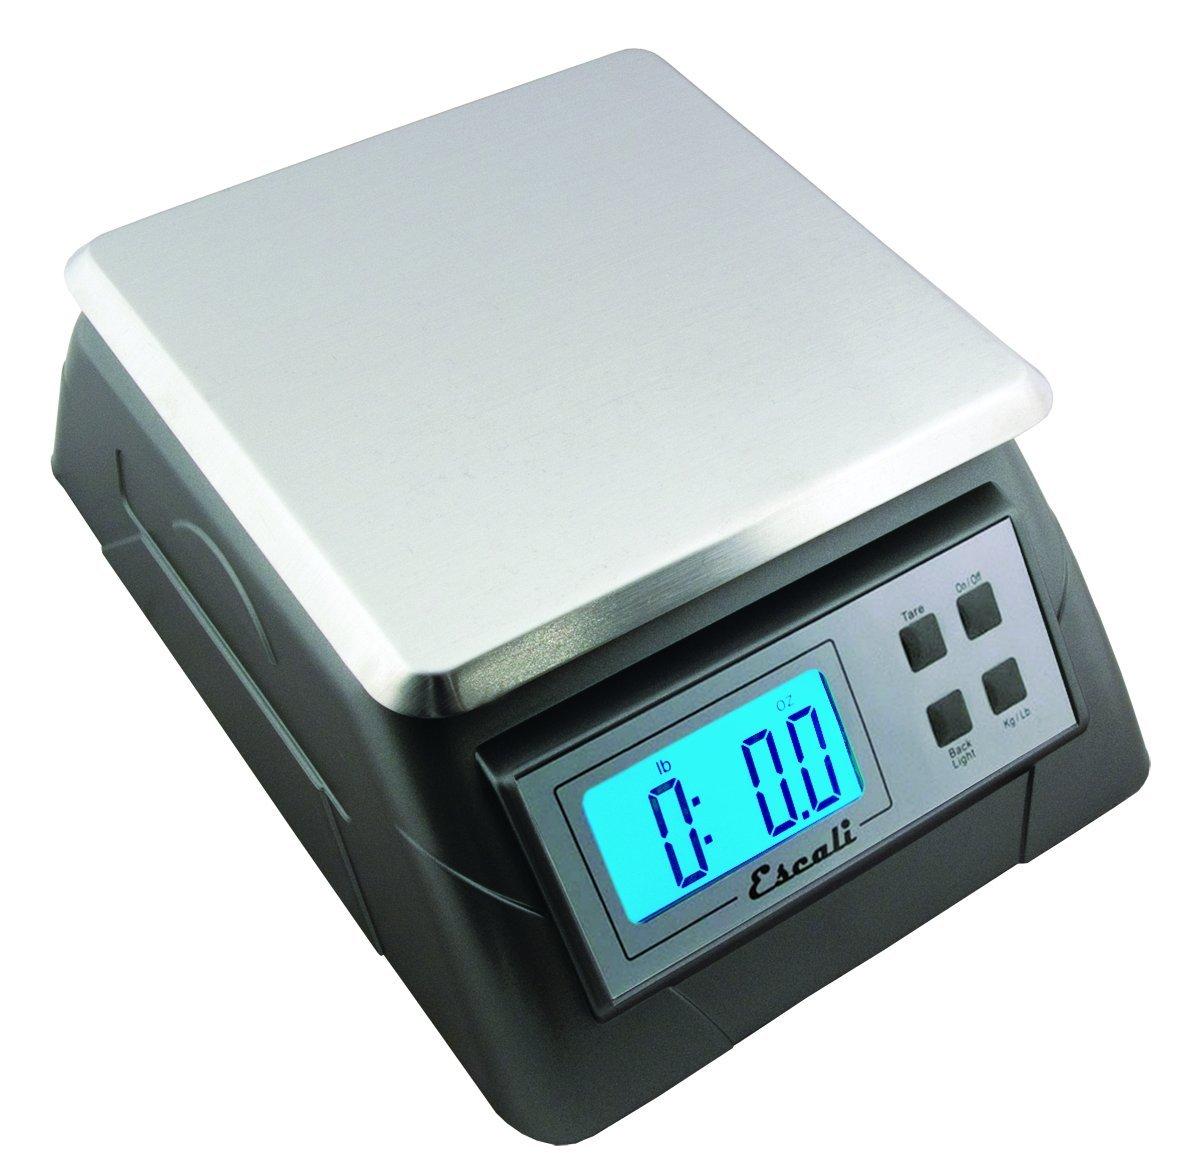 Amazon.com: Escali 136KP Alimento NSF Listed Digital Scale, 13 Lb ...